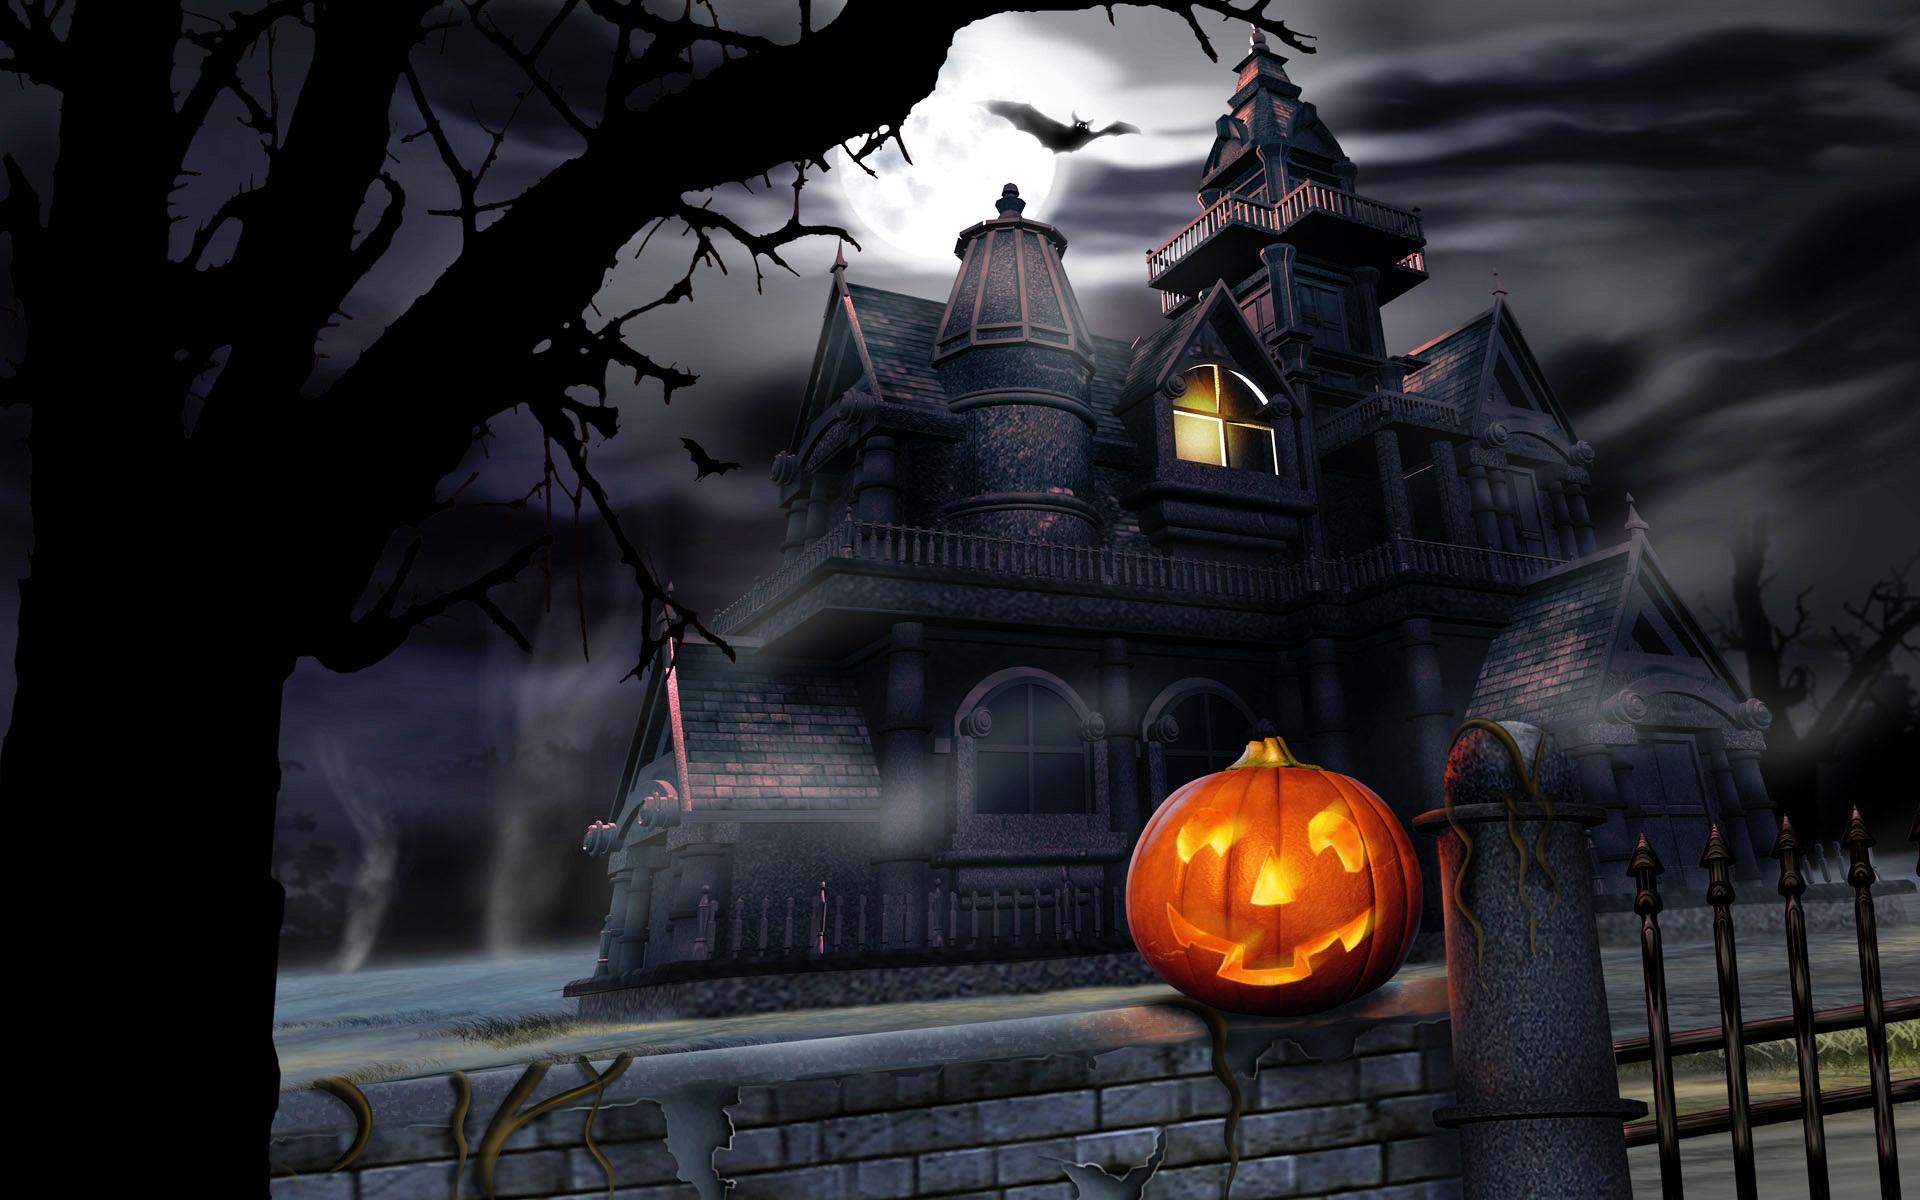 Hd Otife Free Halloween Animated Desktop Wallpaper - Animated Halloween Powerpoint Template , HD Wallpaper & Backgrounds